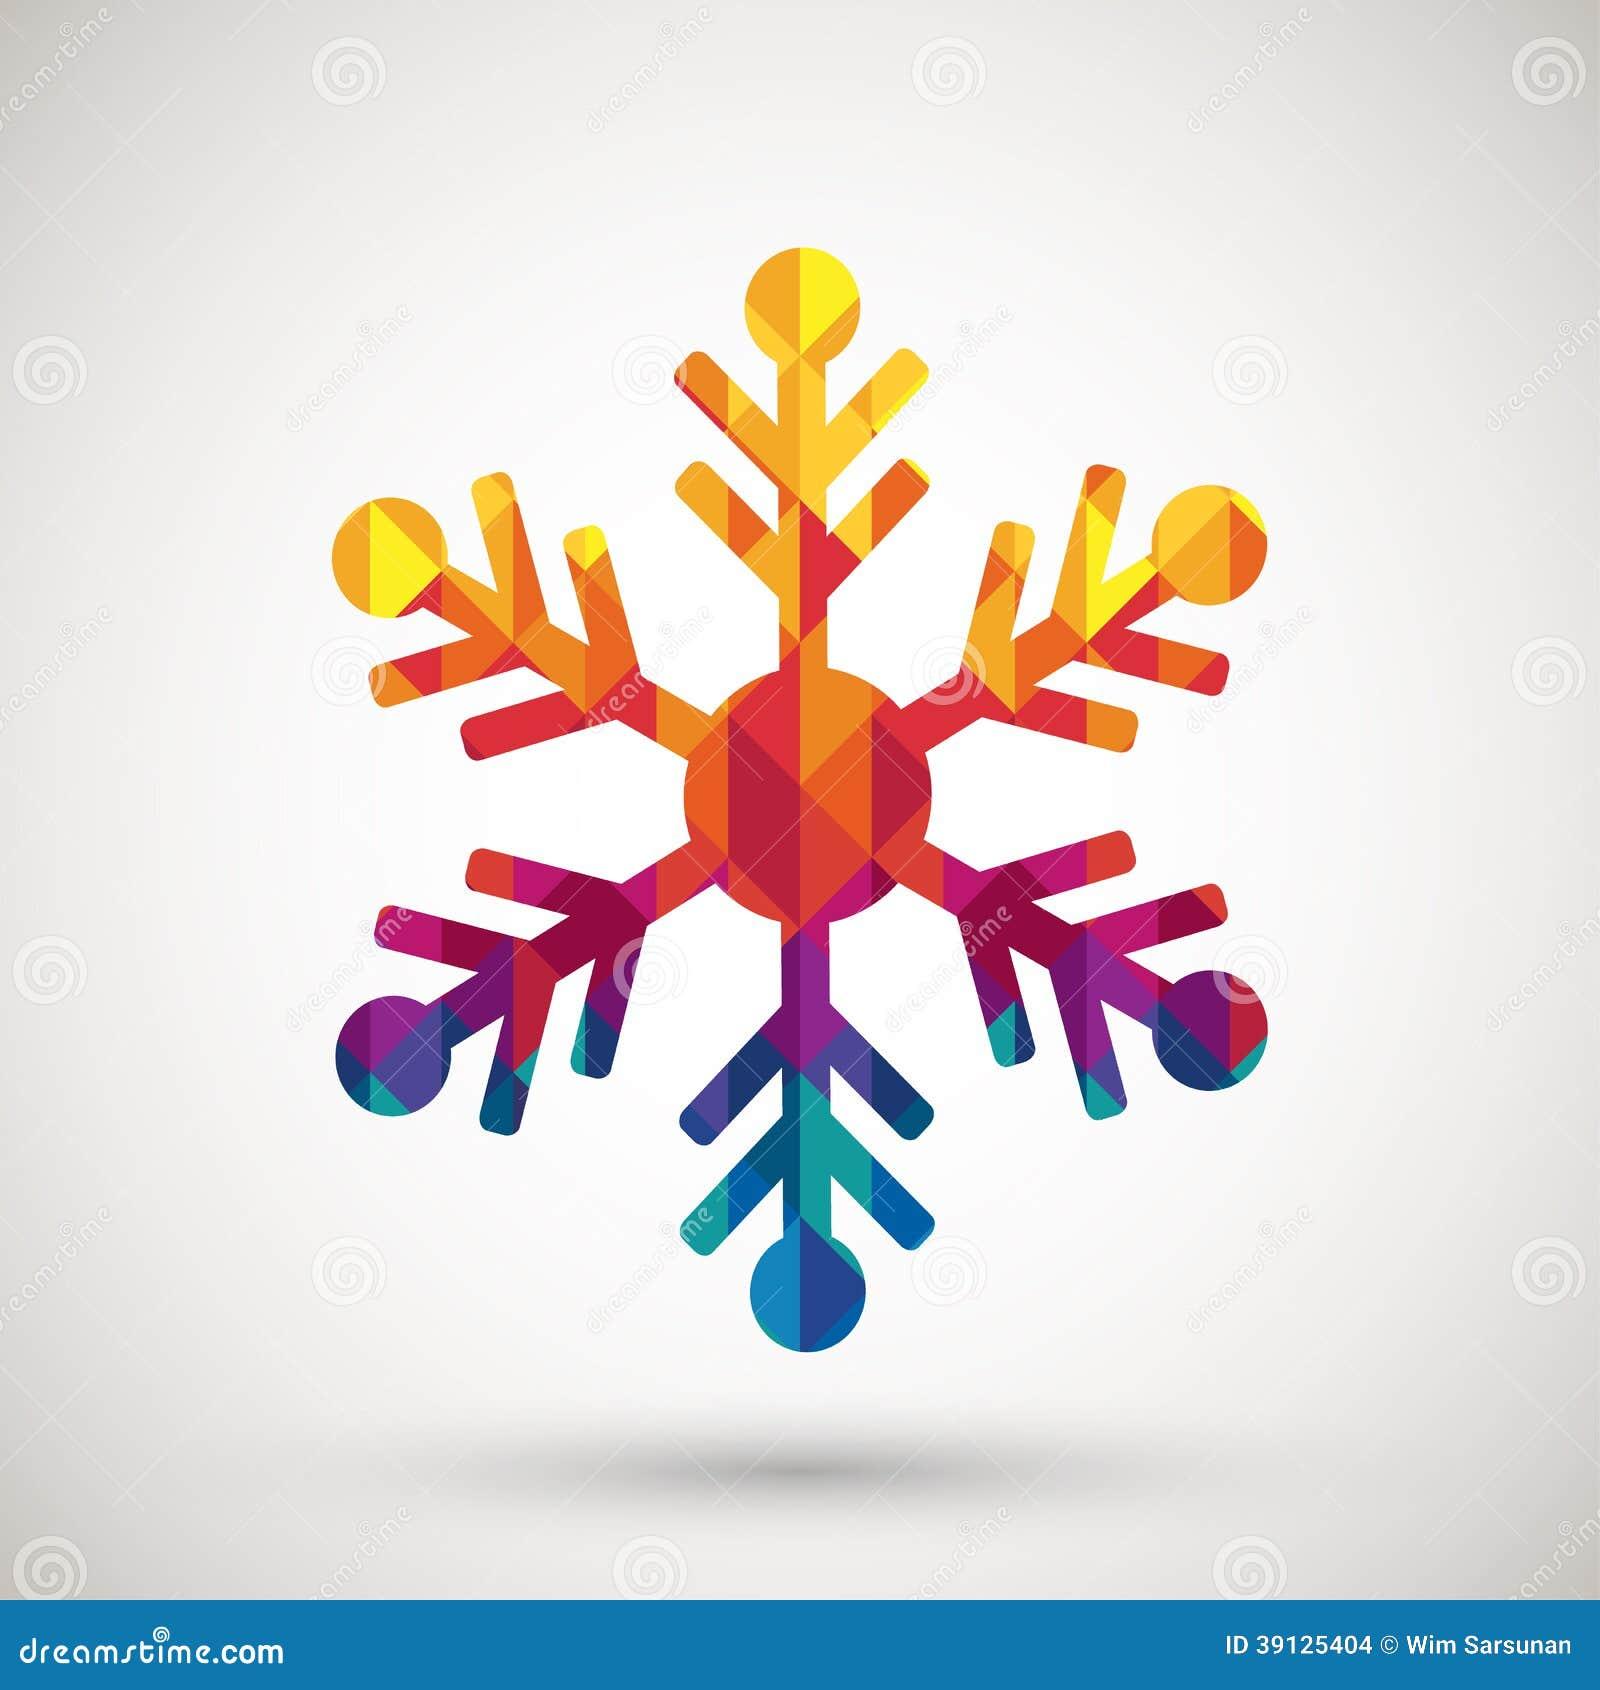 Snowflake Symbol With Colorful Diamond Stock Vector - Image: 39125404